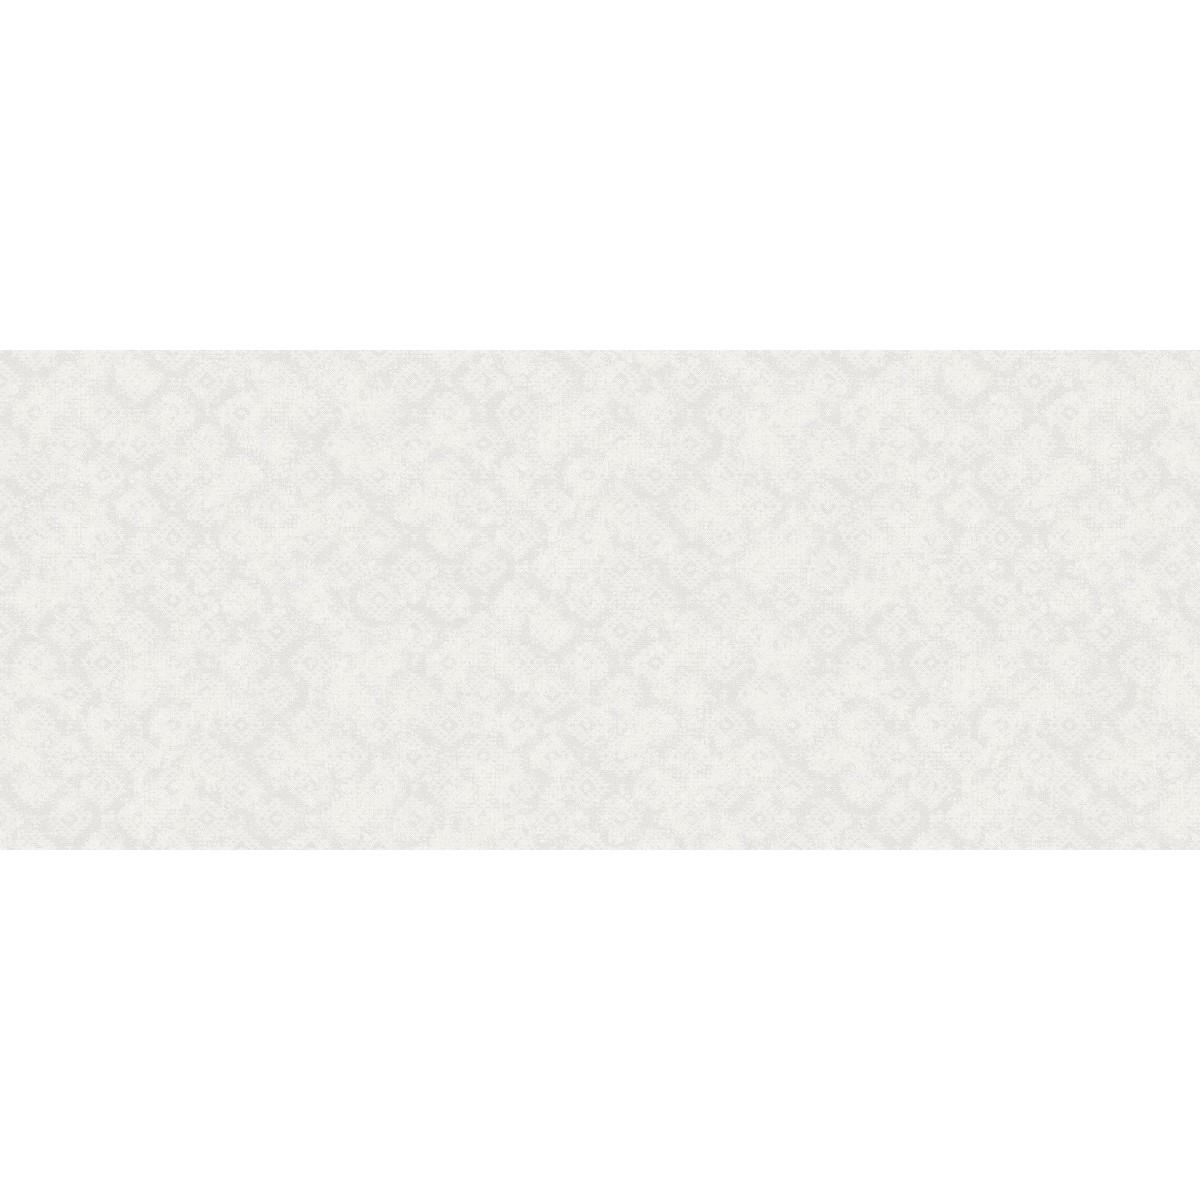 Обои флизелиновые Victoria Stenova Don Corleone золотые 889802 1.06 м